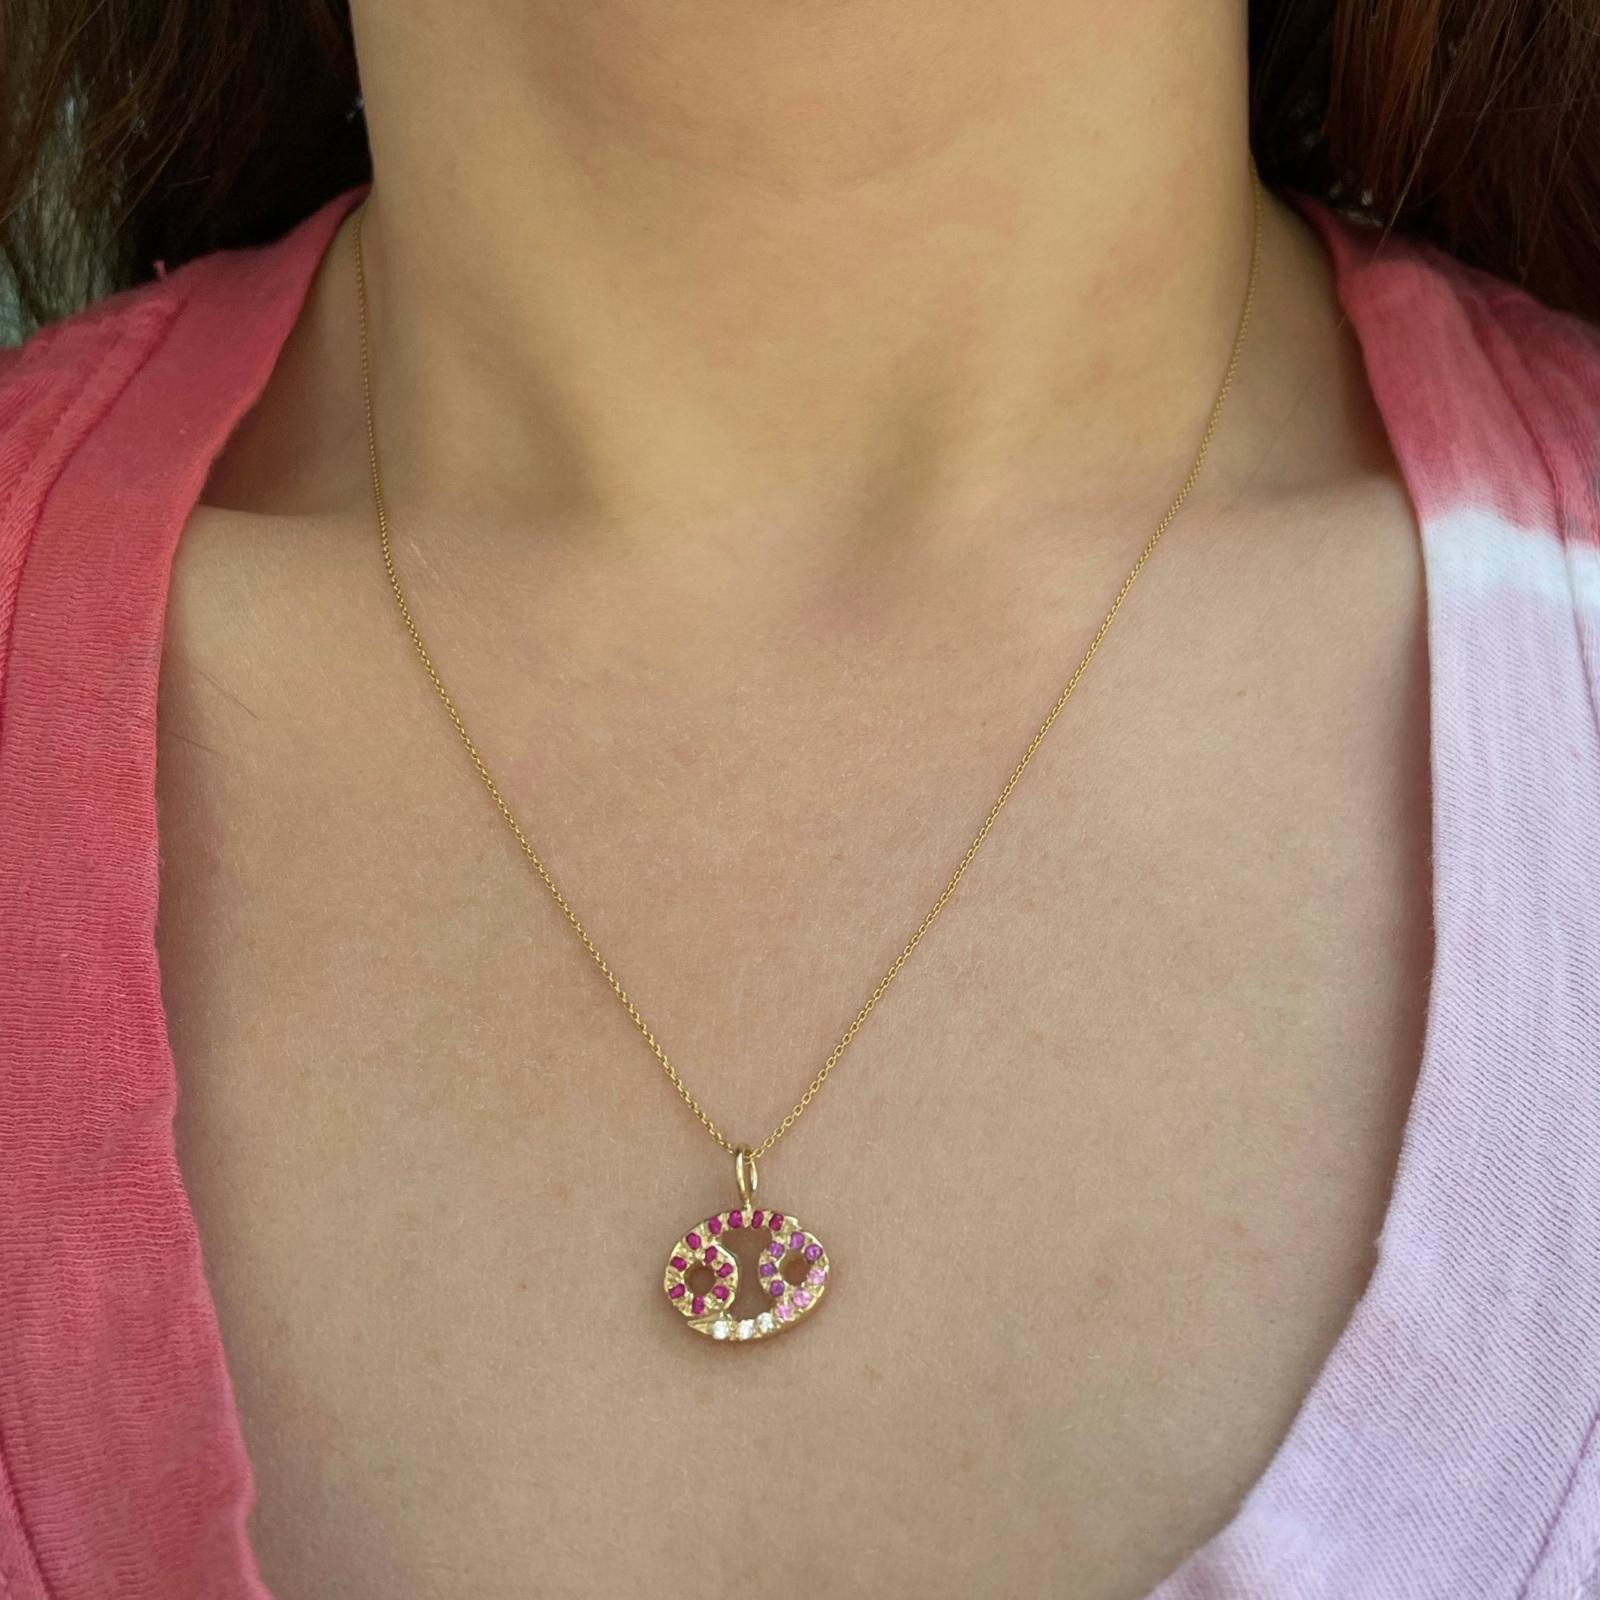 Cancer zodiac sign charm pendant necklace